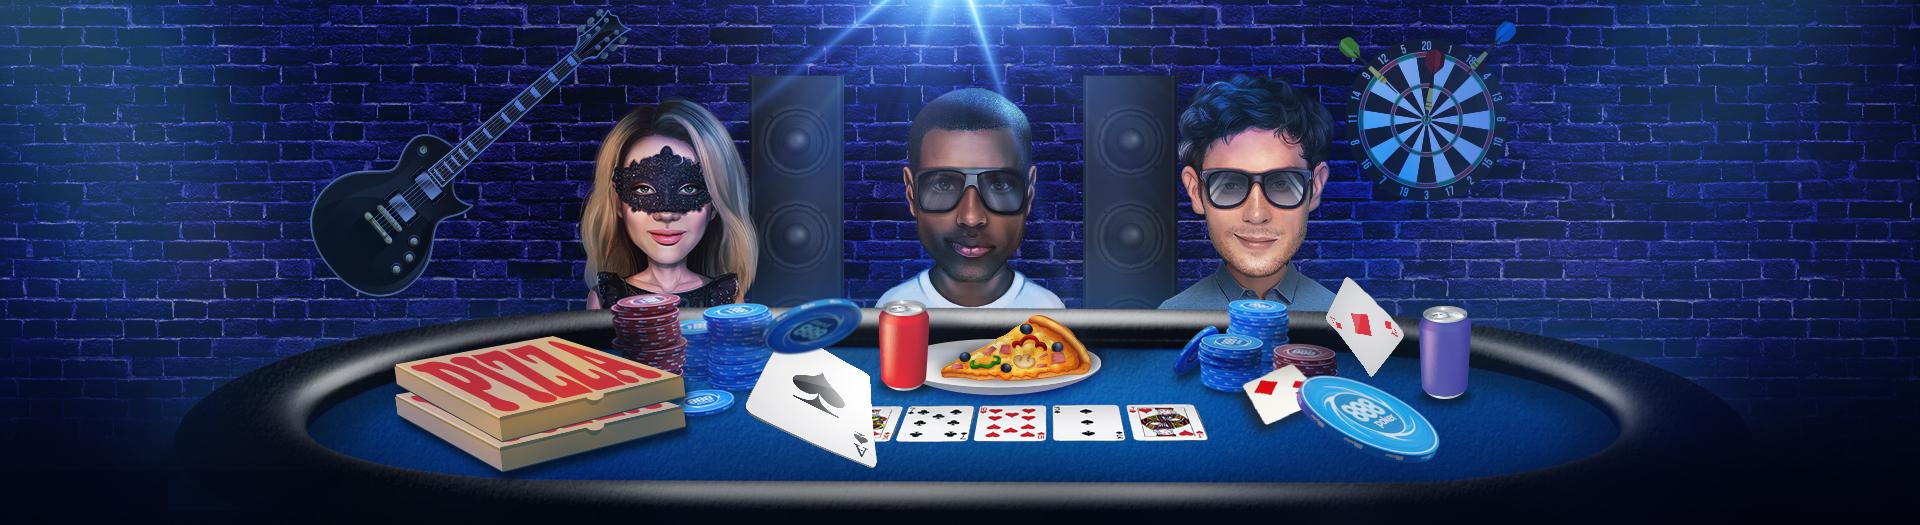 Joaca poker cu prietenii pe 888! Organizeaza o noapte de poker!